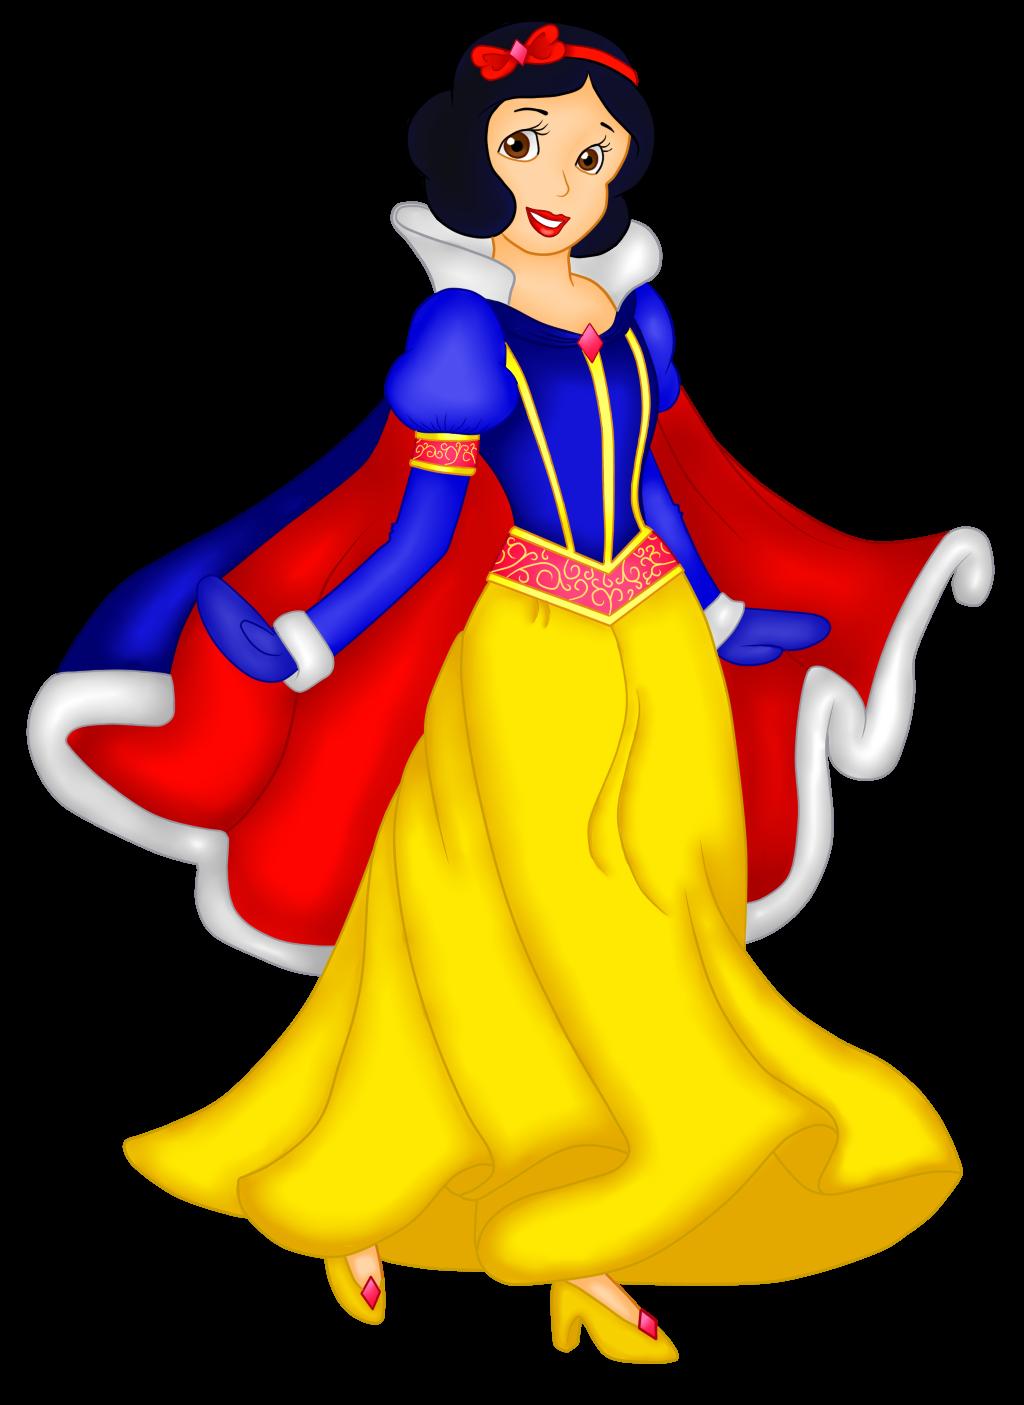 Snow White Png Transparent Images Snow White Snow White Art Snow